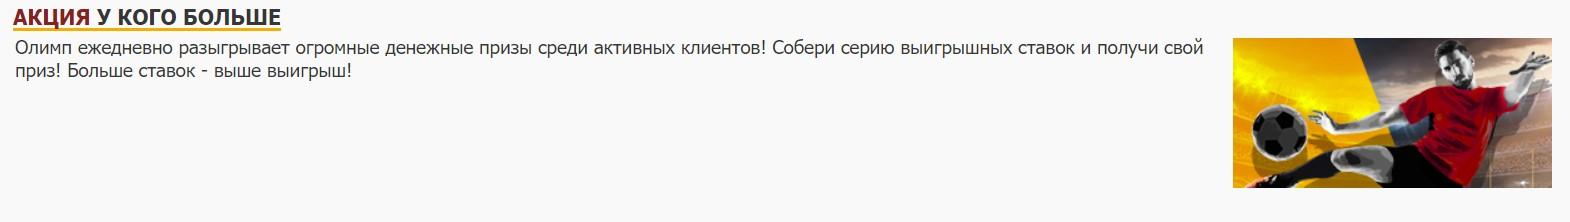 "акция ""У кого больше"" Олимп"